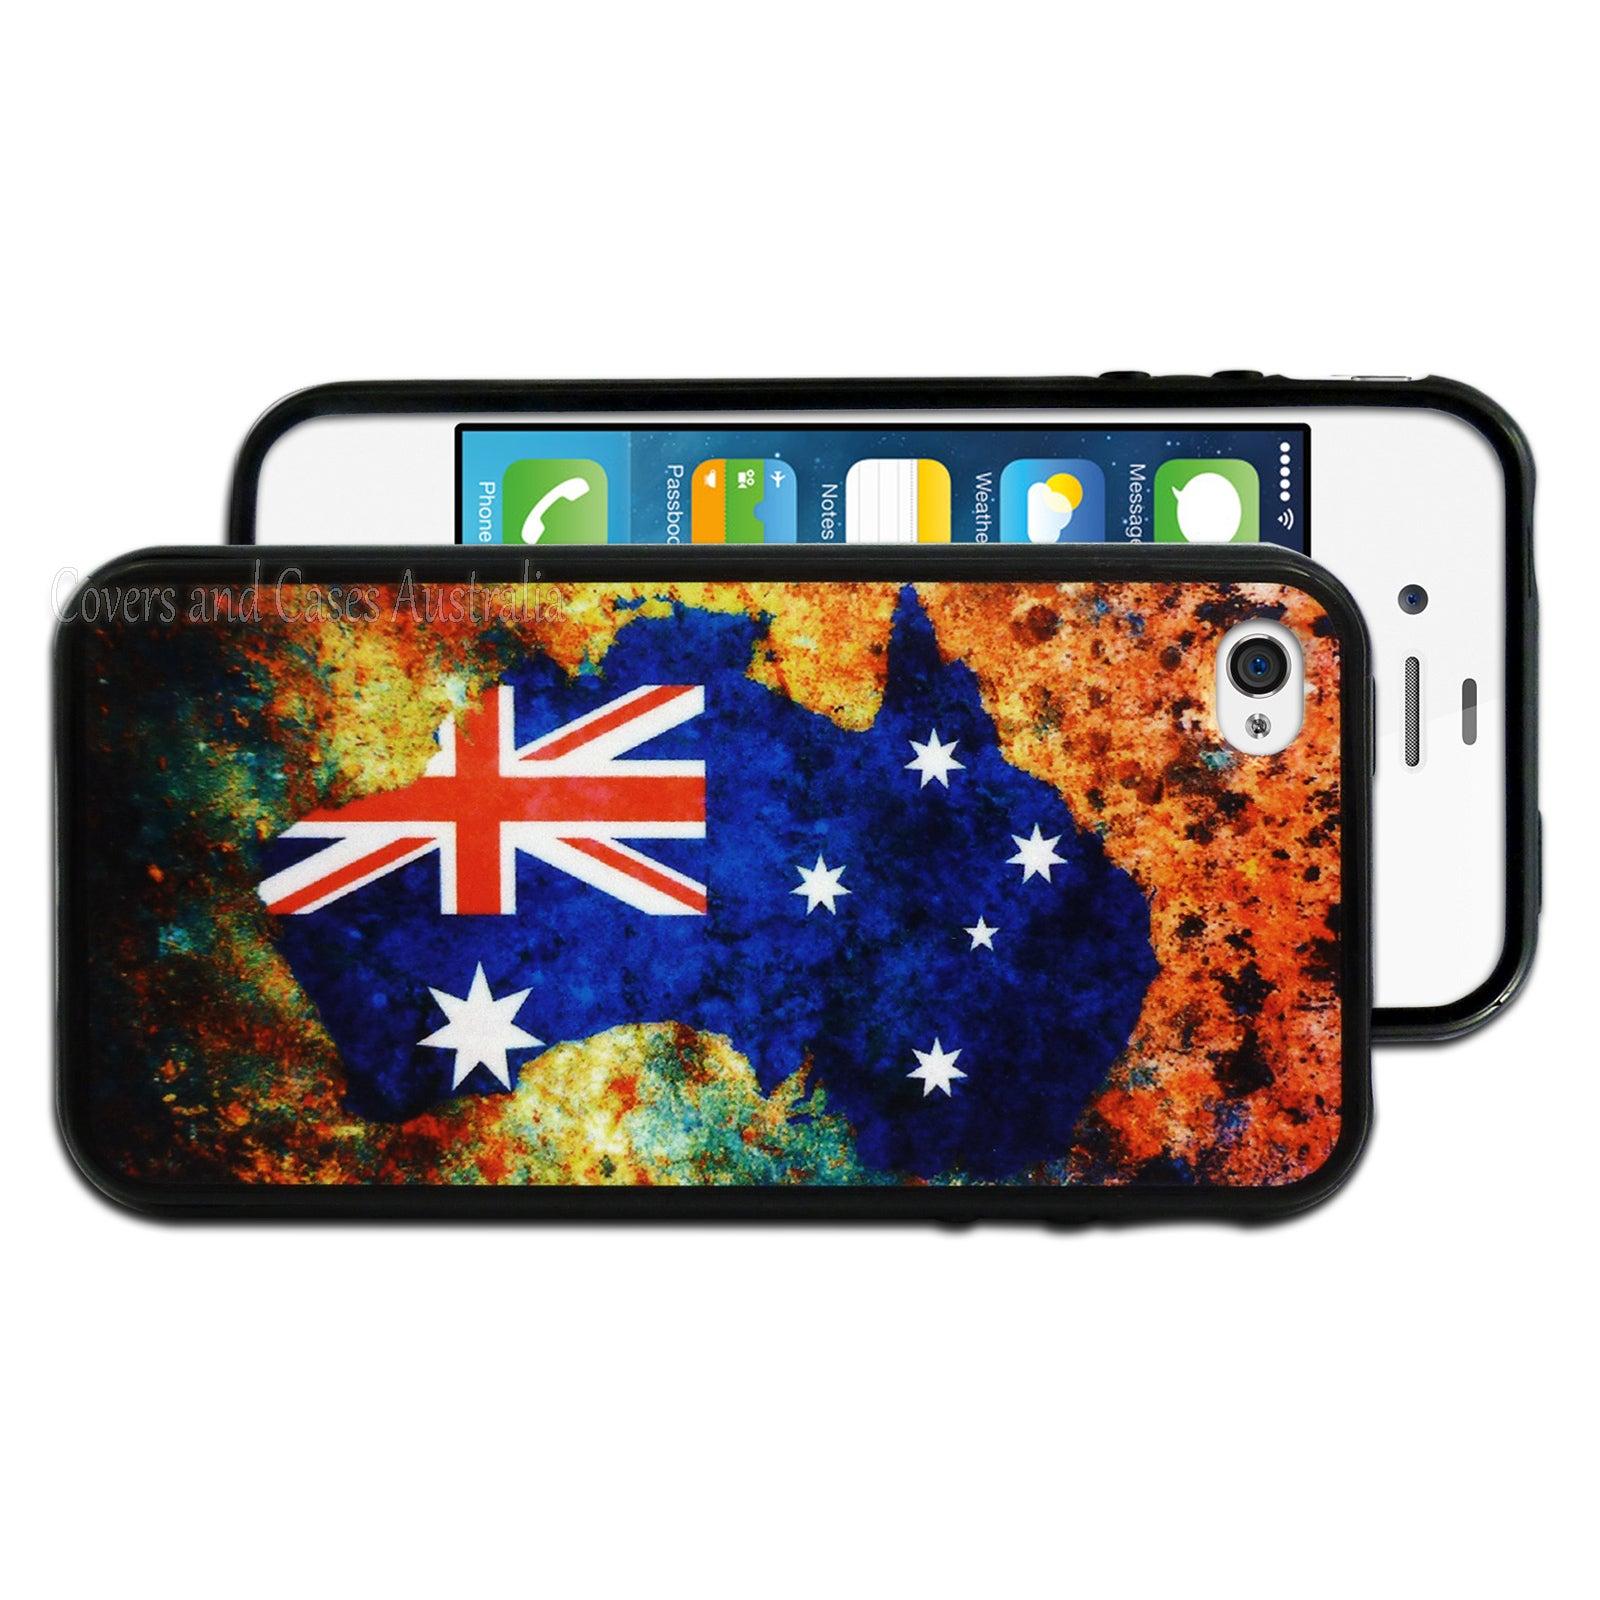 Australia Flag Printed Map Hard Back Case for Apple iPhone 4 4S